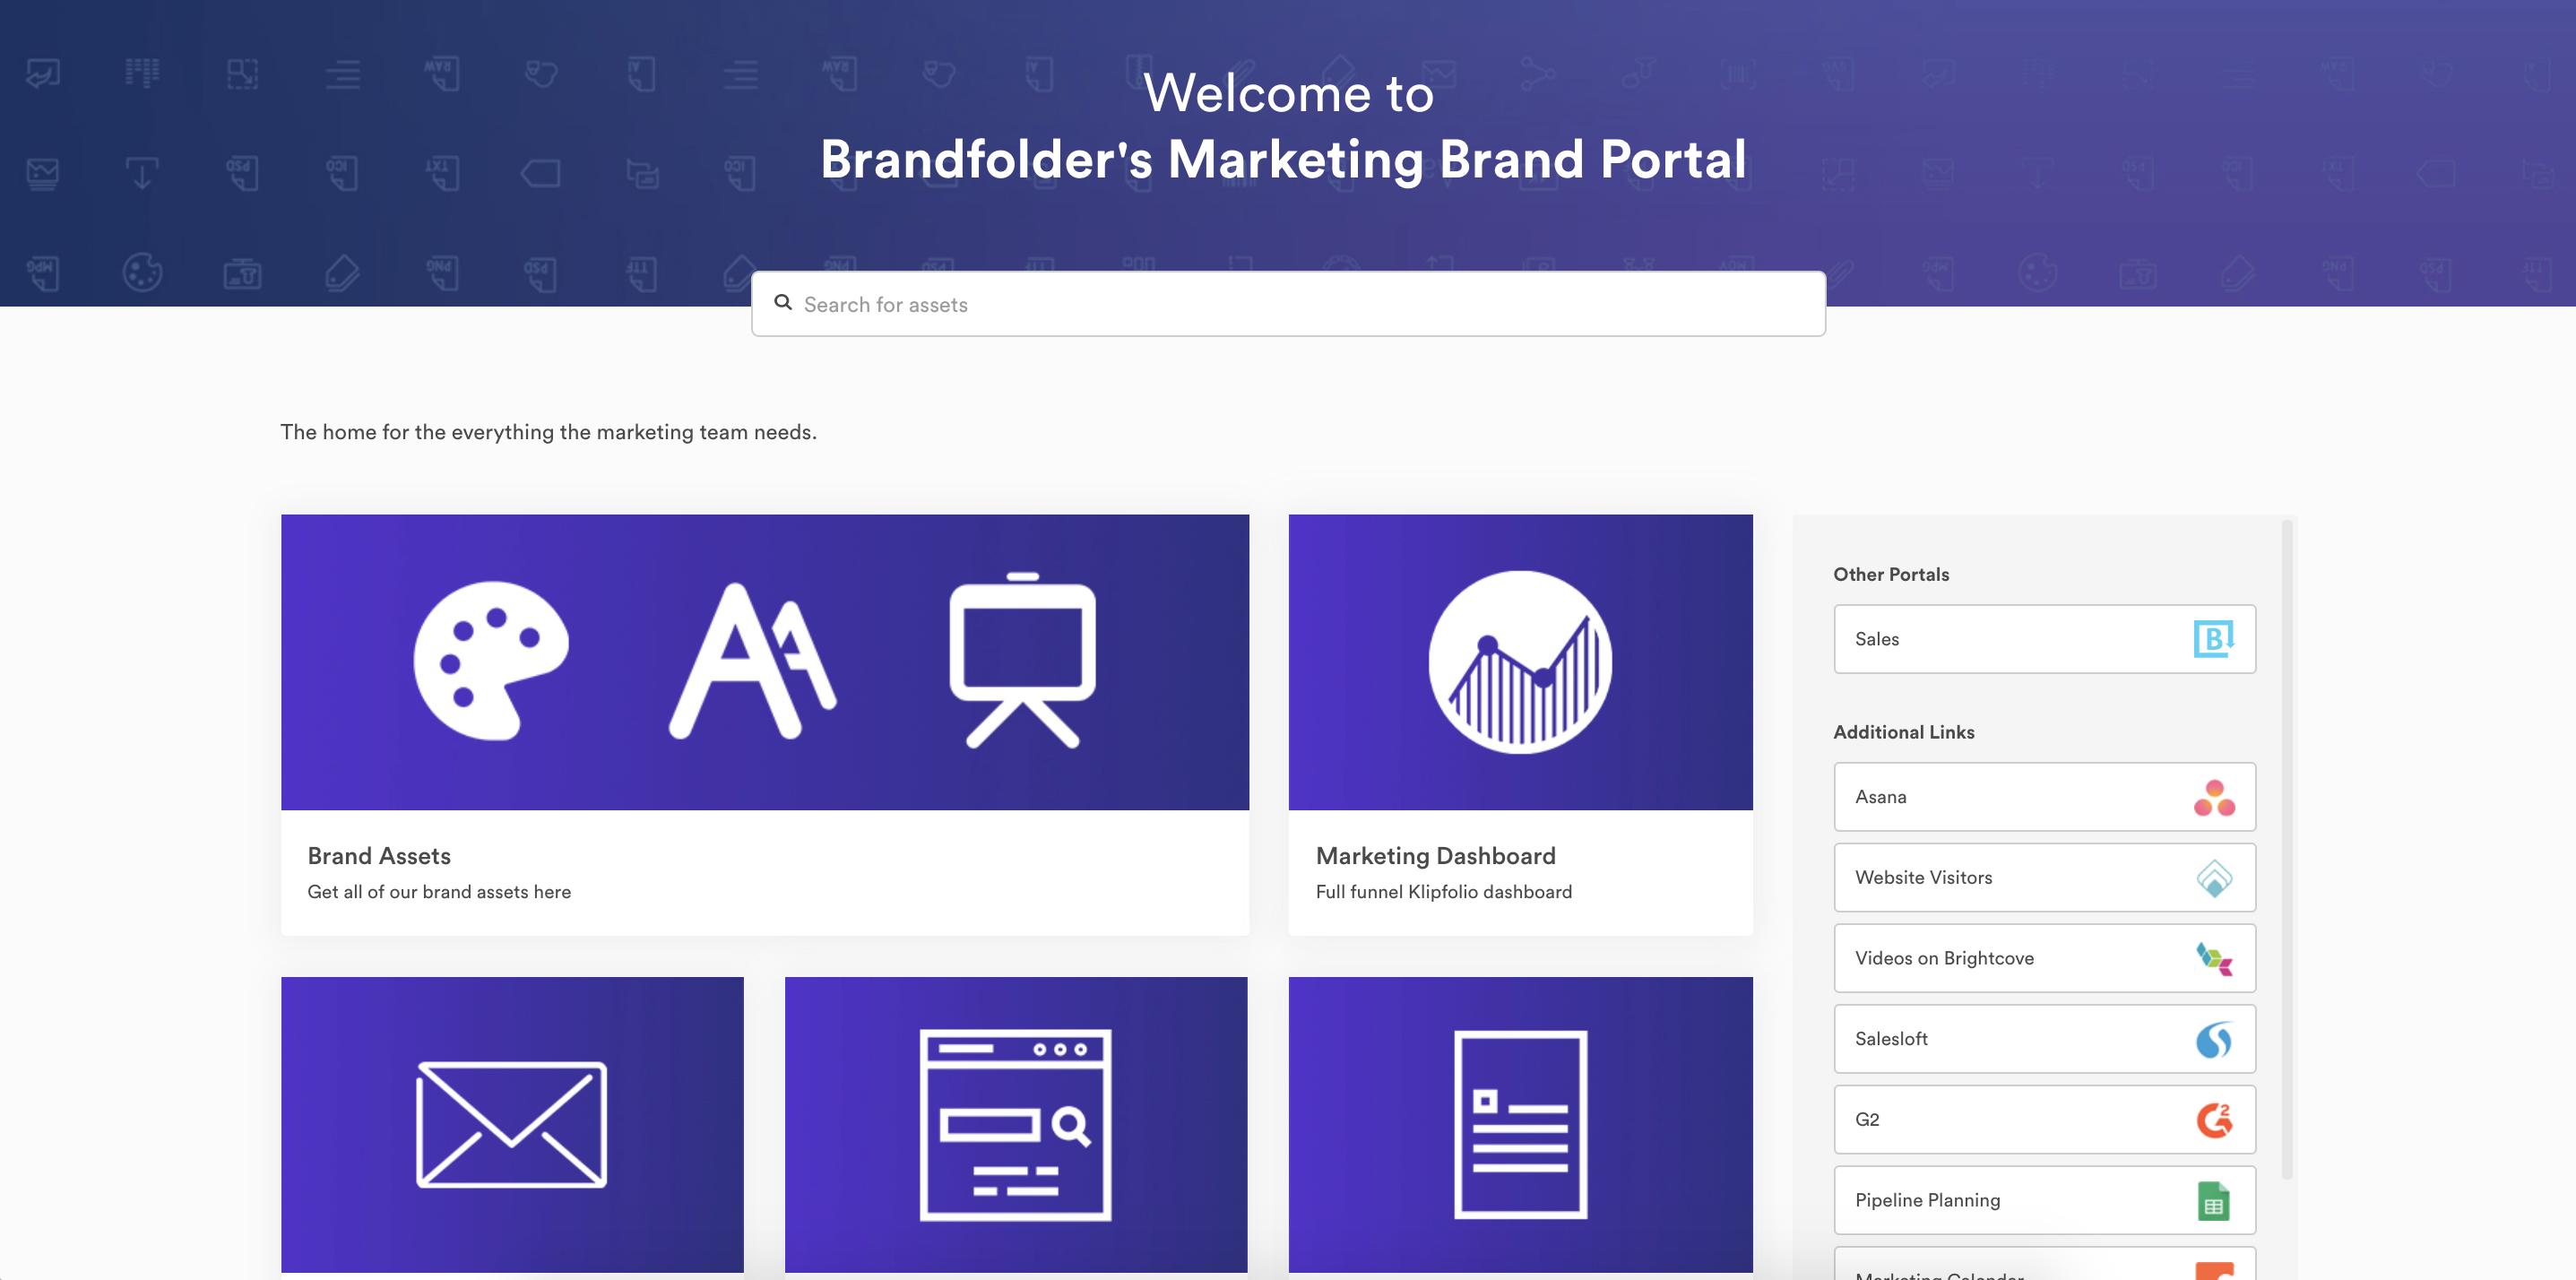 Brandfolder Marketing Portal